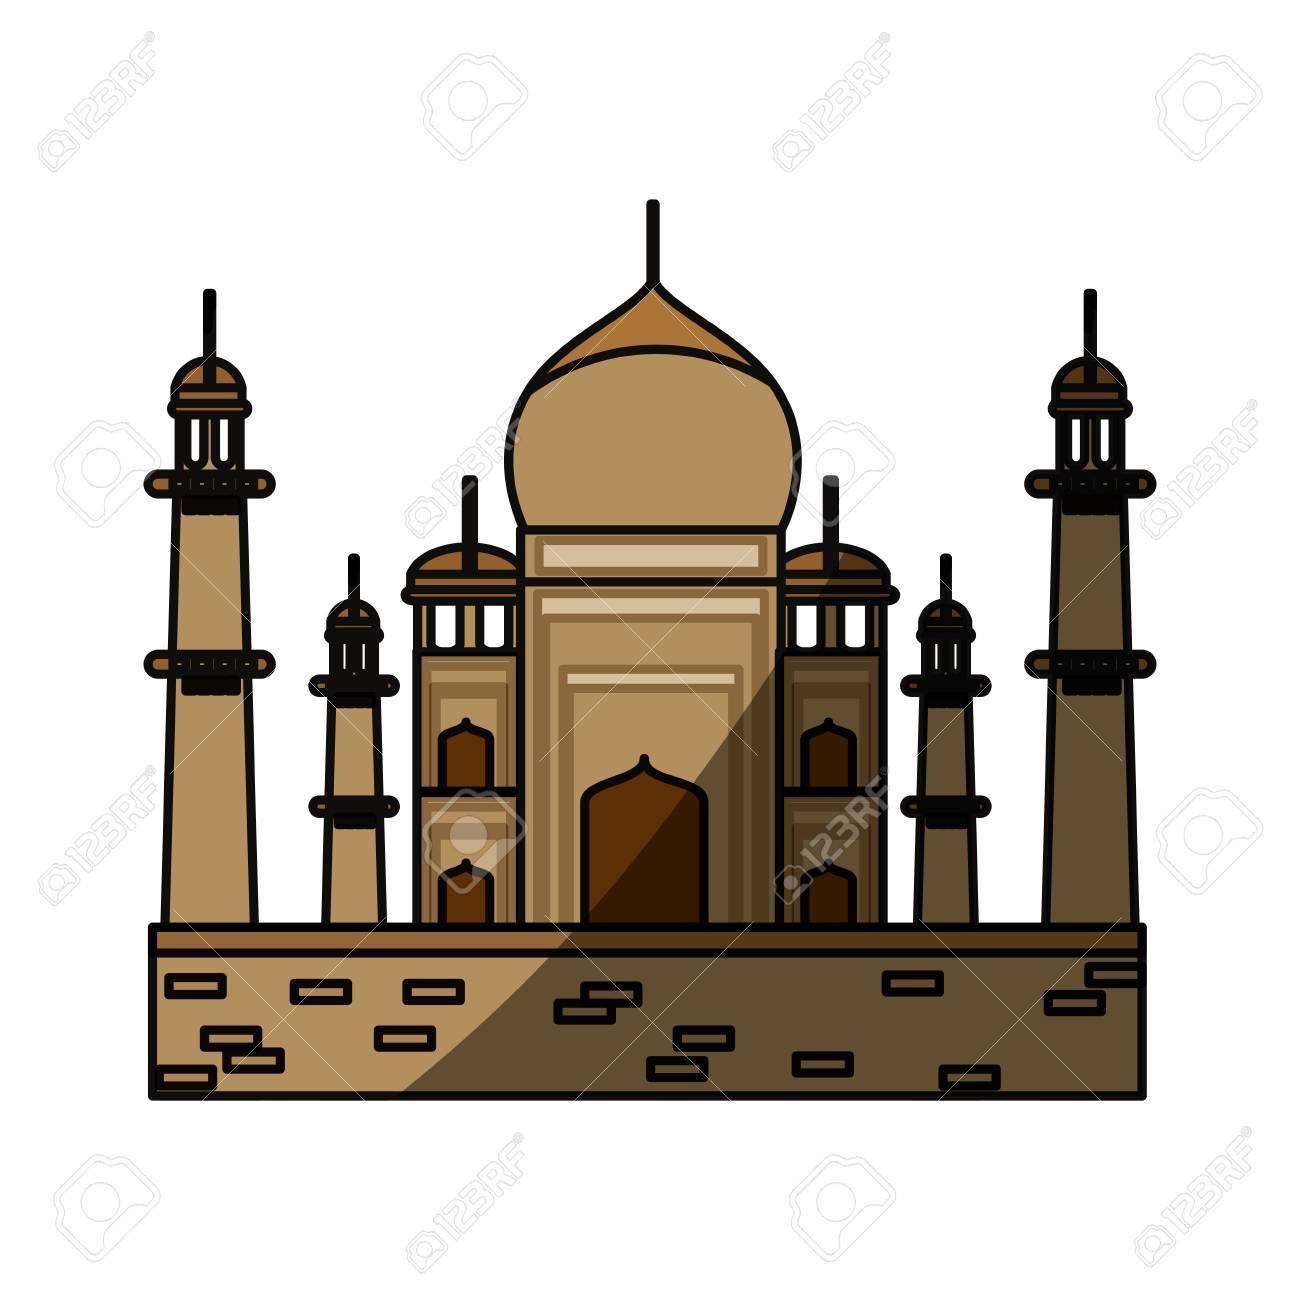 taj mahal monument icon vector illustration graphic design royalty rh 123rf com clipart taj mahal vector taj mahal clip art black and white